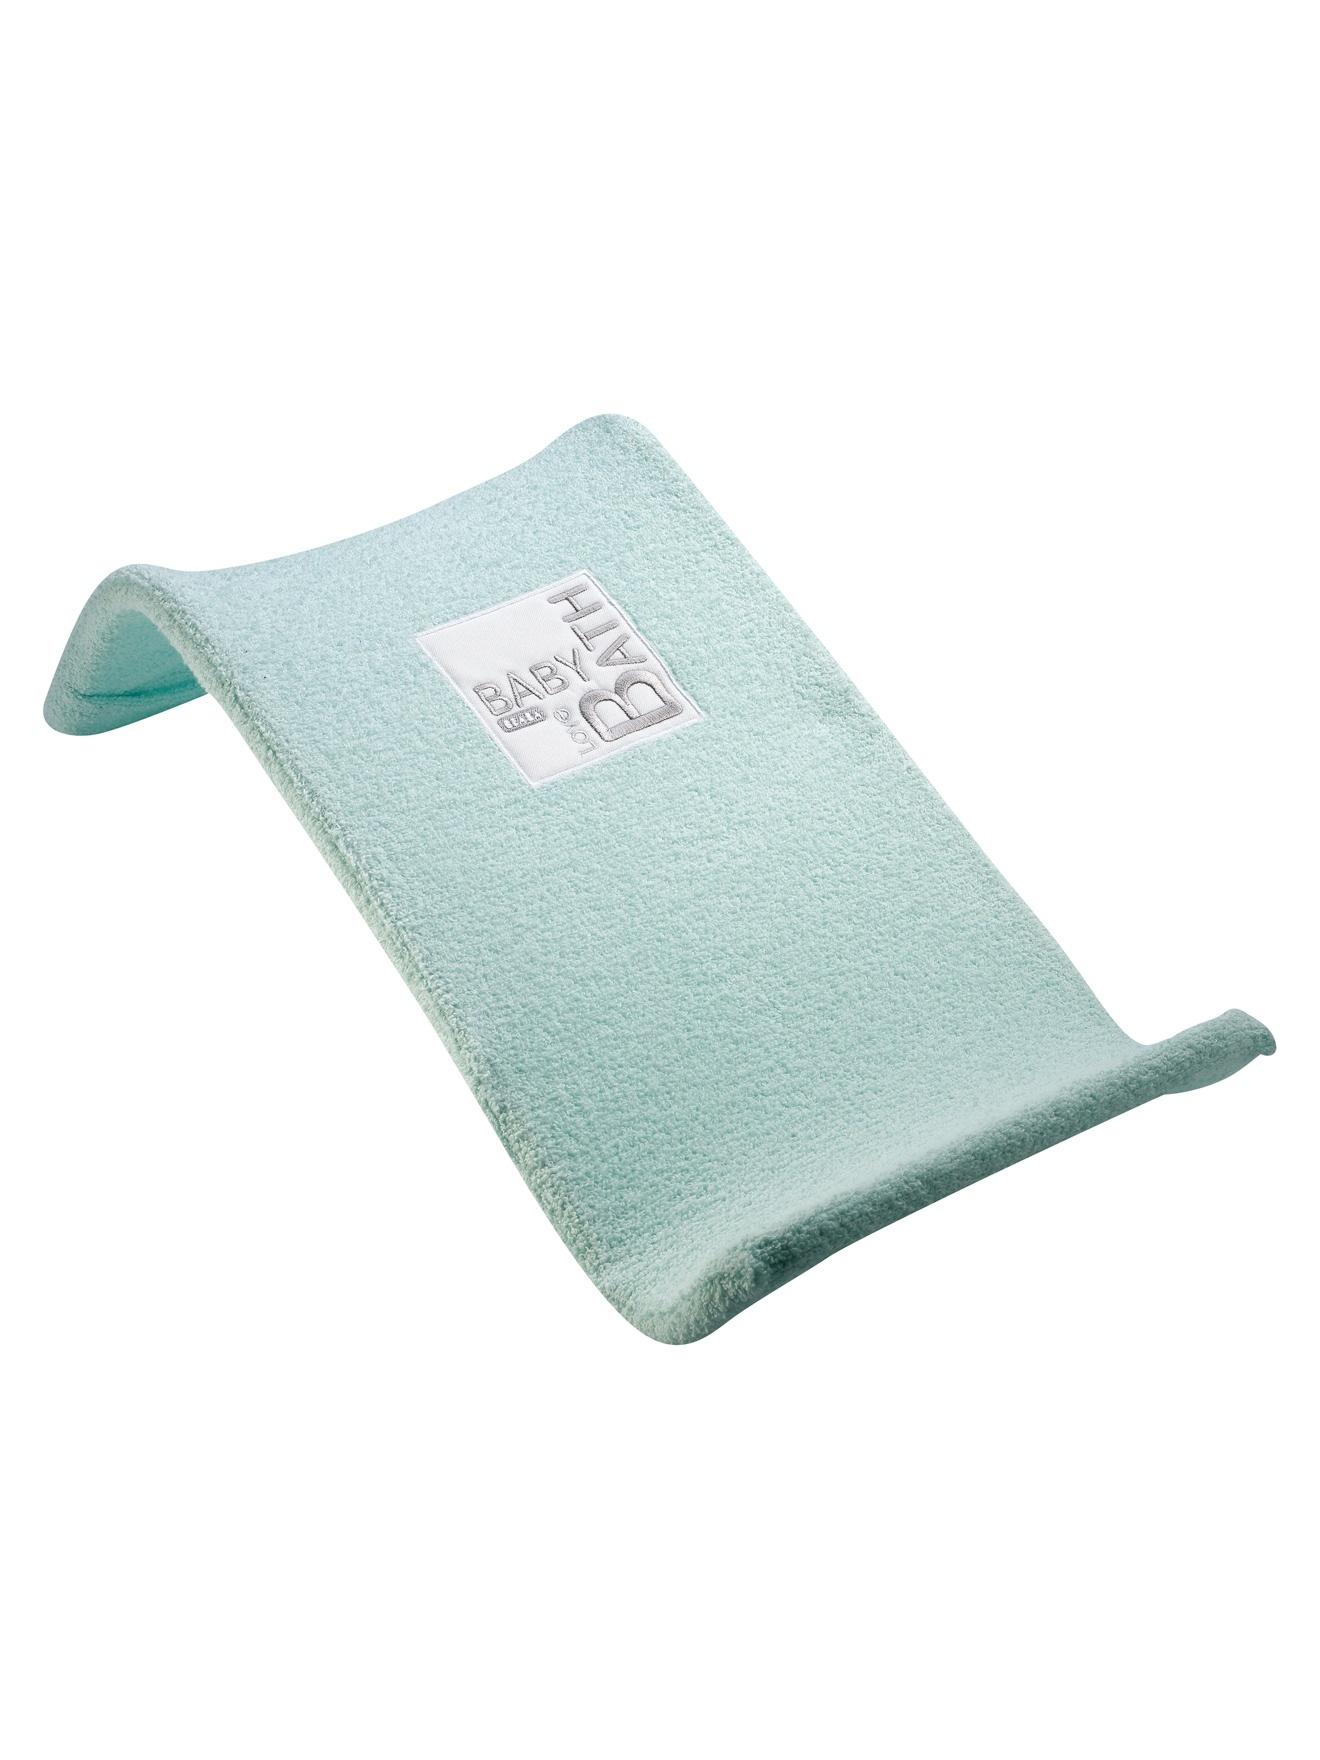 transat de bain en tissu ponge confidences de maman